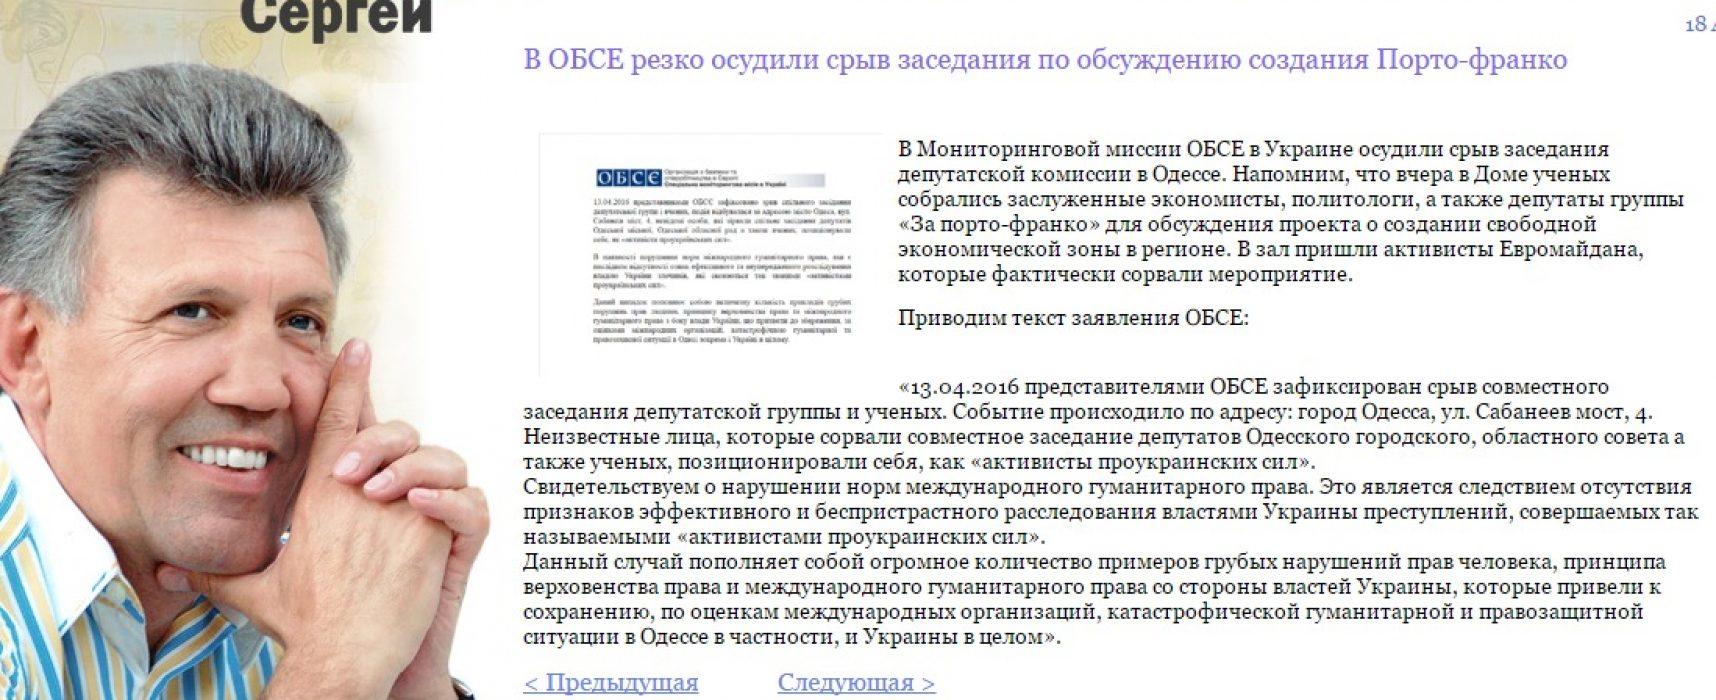 Odessa Media Publish Fake OSCE Report